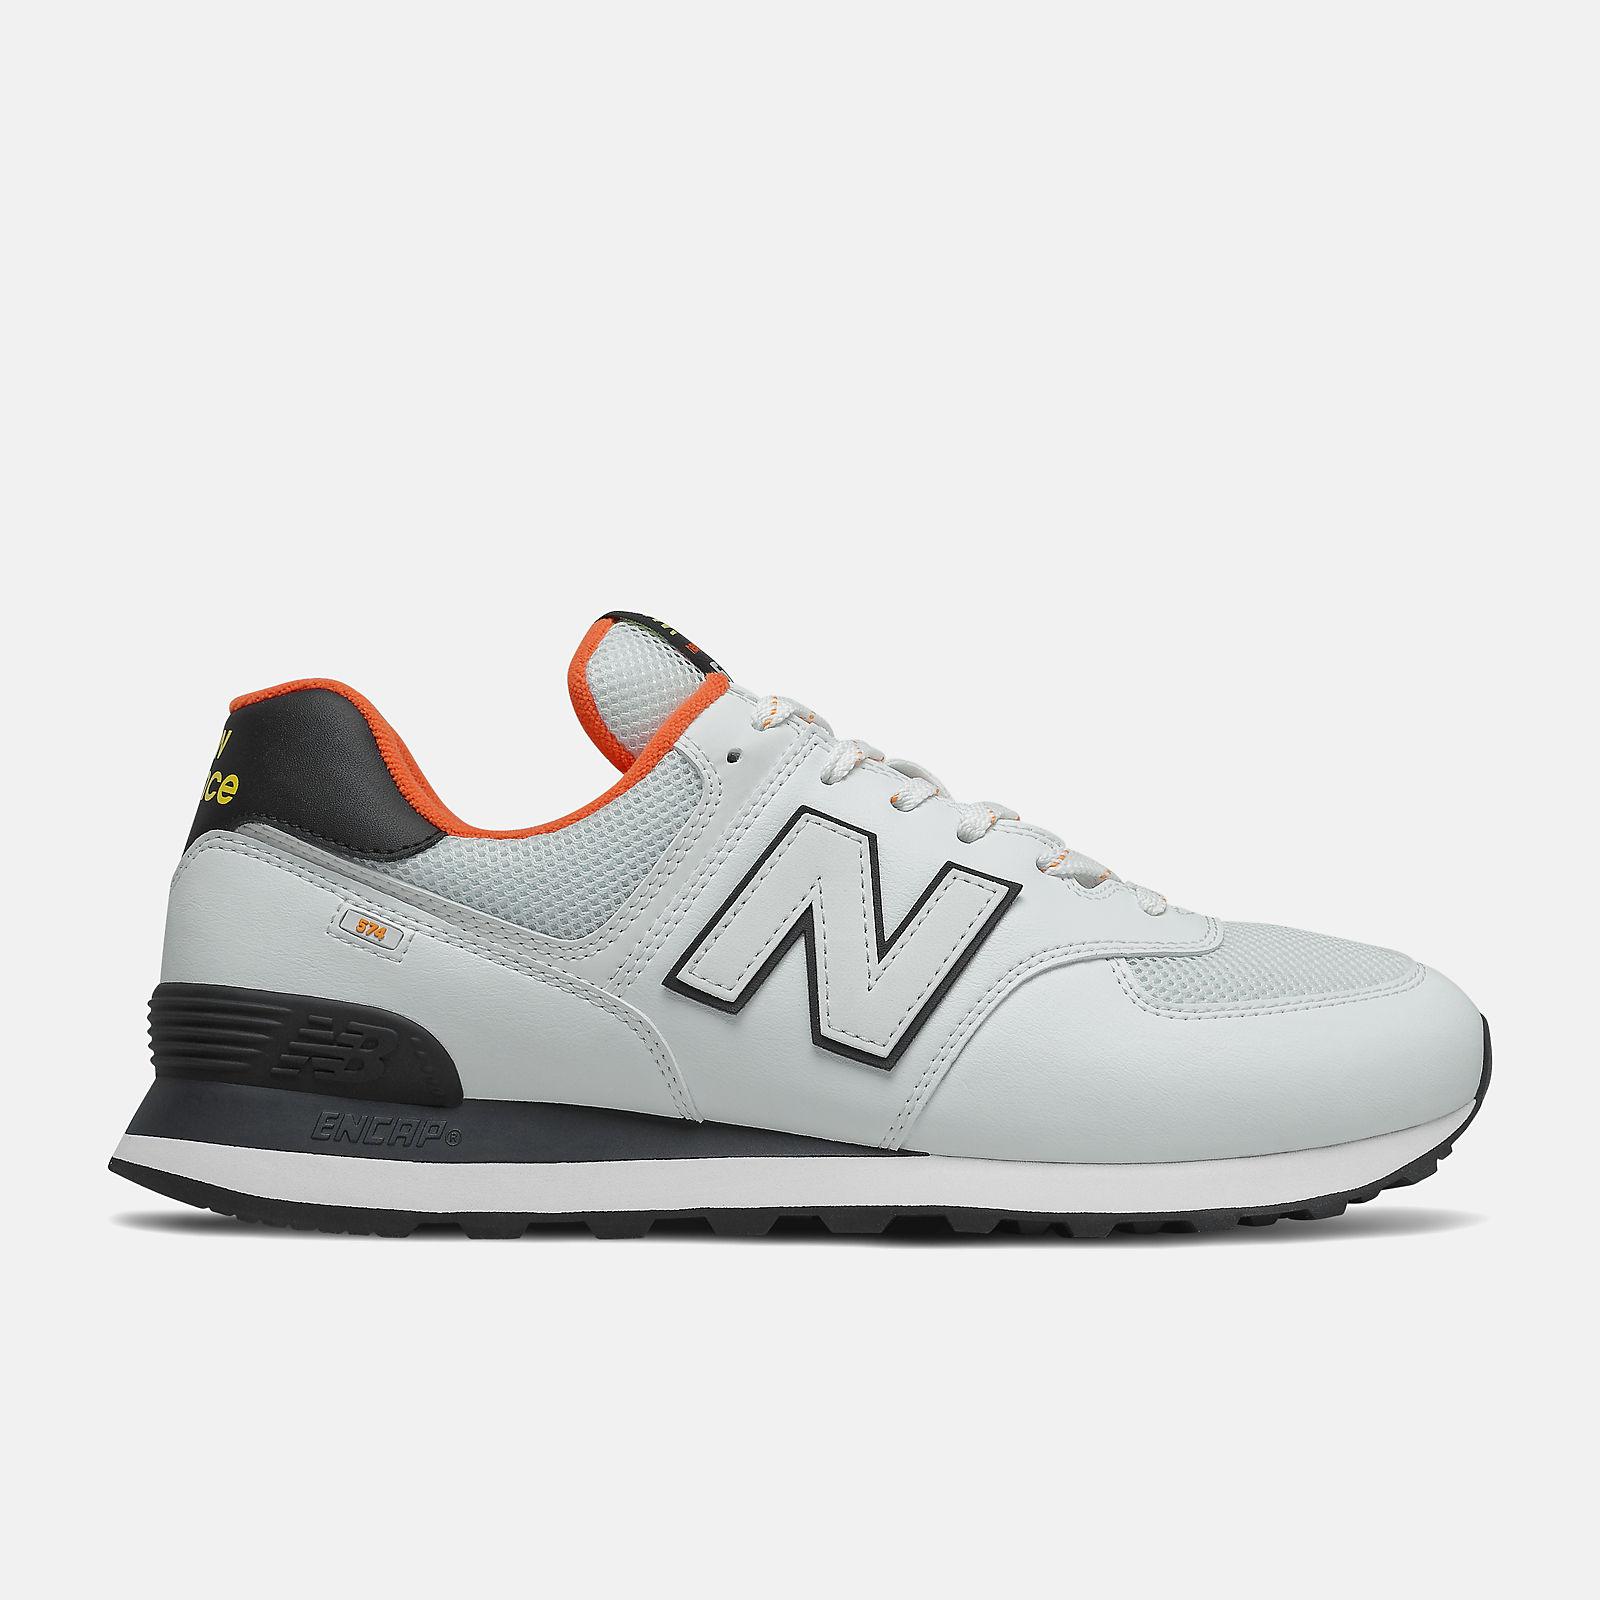 574 - New Balance